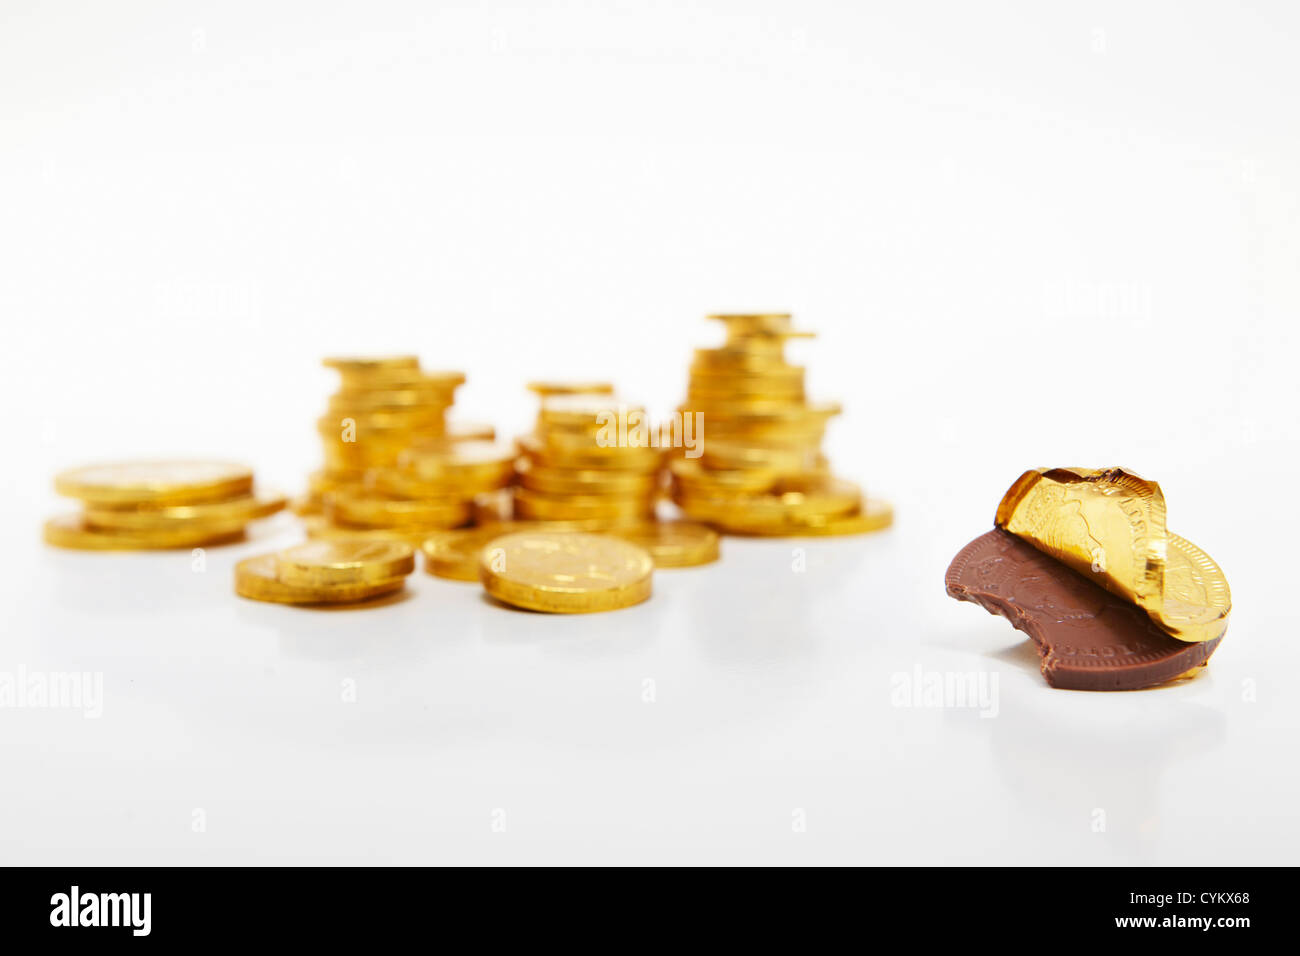 Unverpackte Schokolade Goldmünze Stockbild